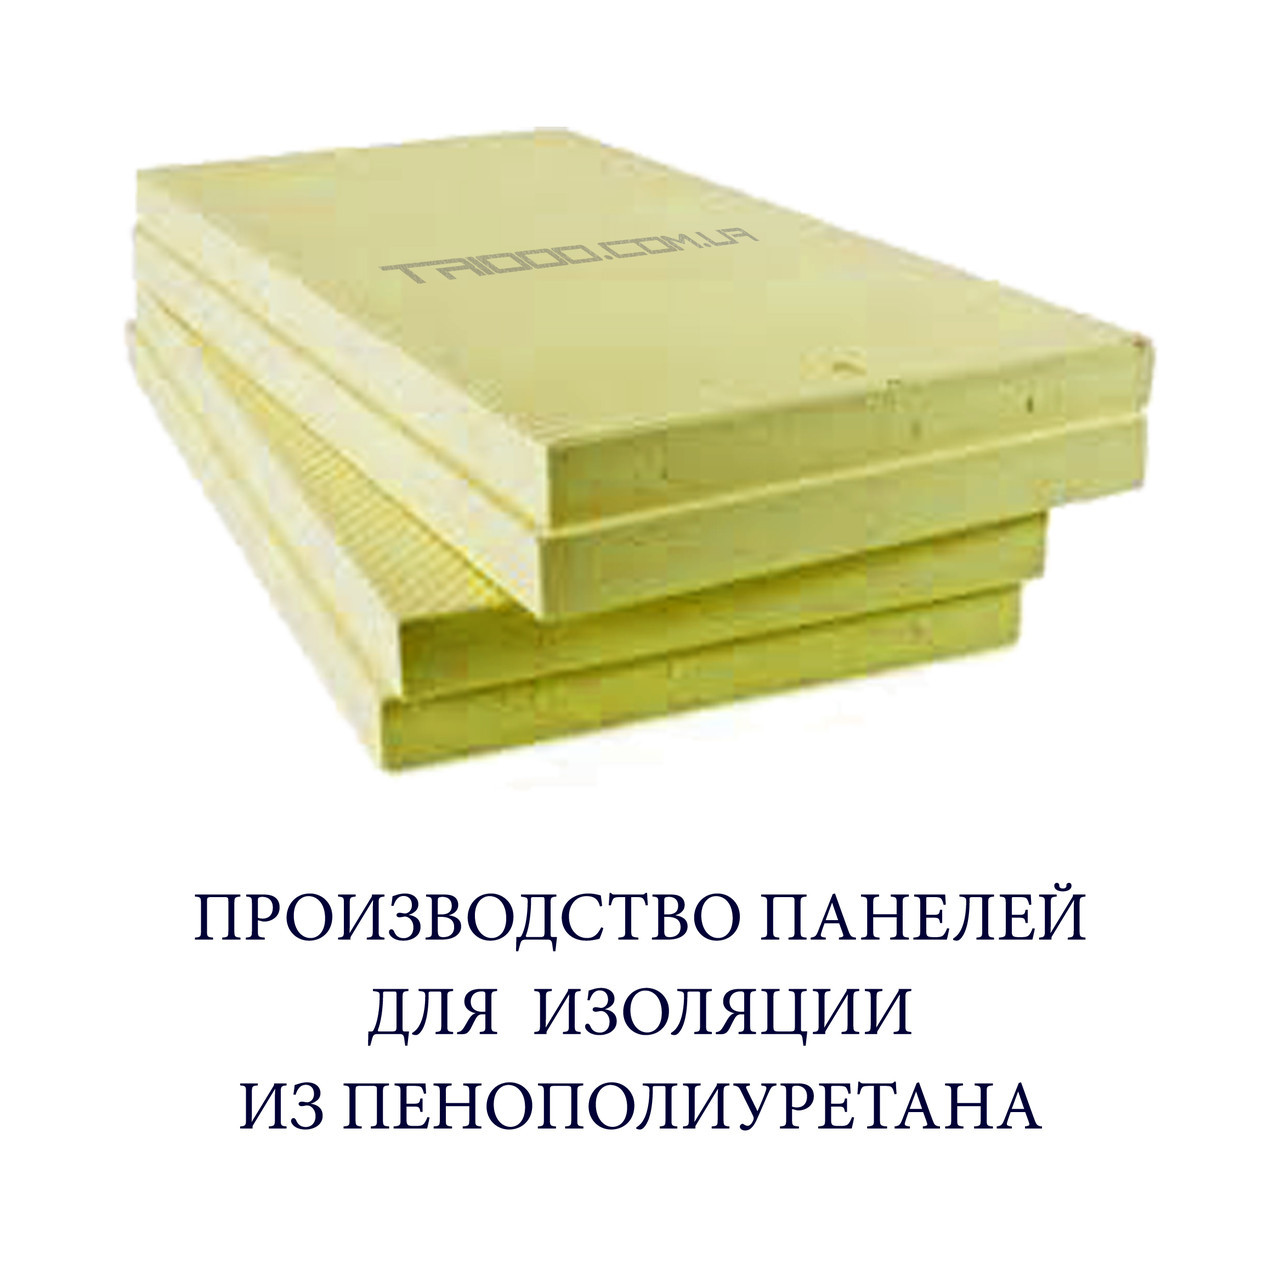 Плита пенополиуретановая (панель ППУ) 1200 х 600 х 60 мм